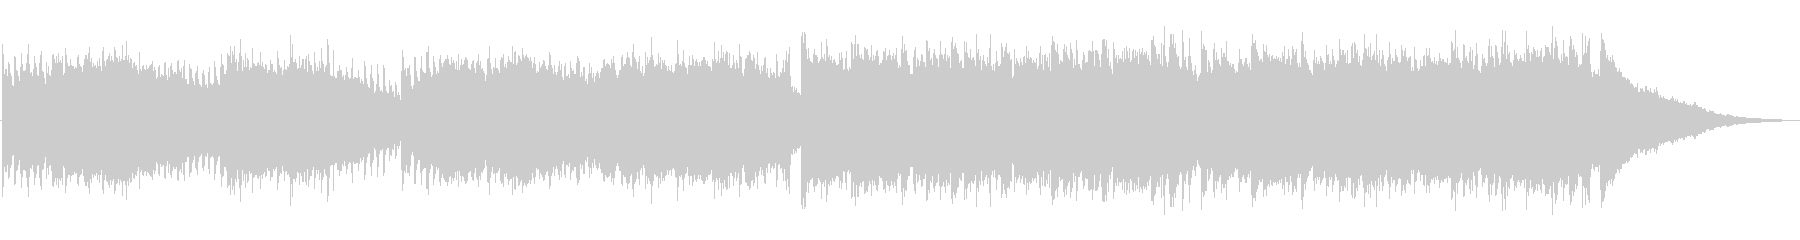 CM / Painful and gentle acoustic pops's unreproduced waveform